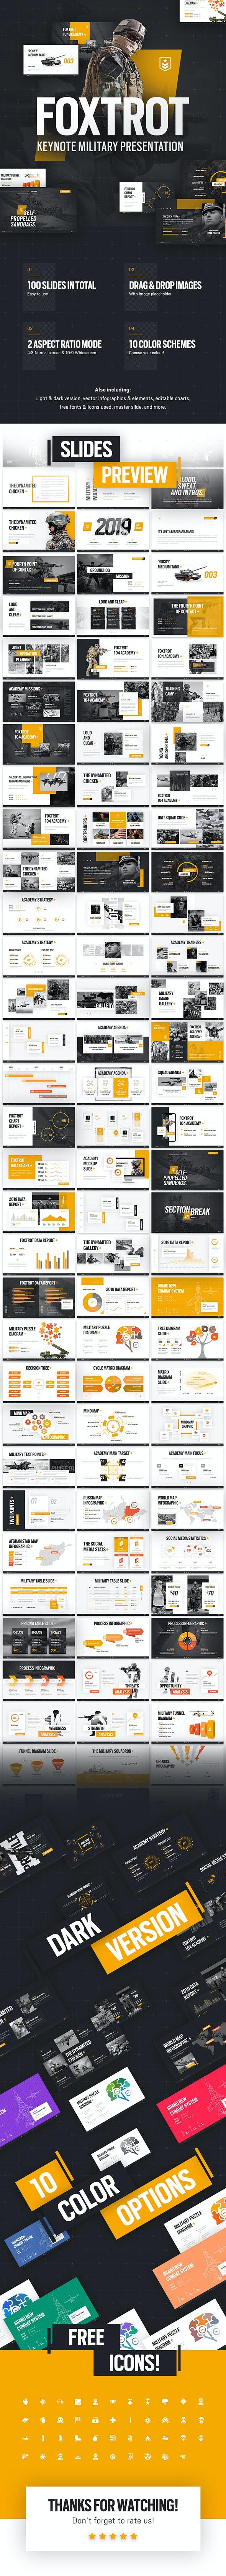 Foxtrot Military Keynote Presentation Template - Keynote Templates Presentation Templates